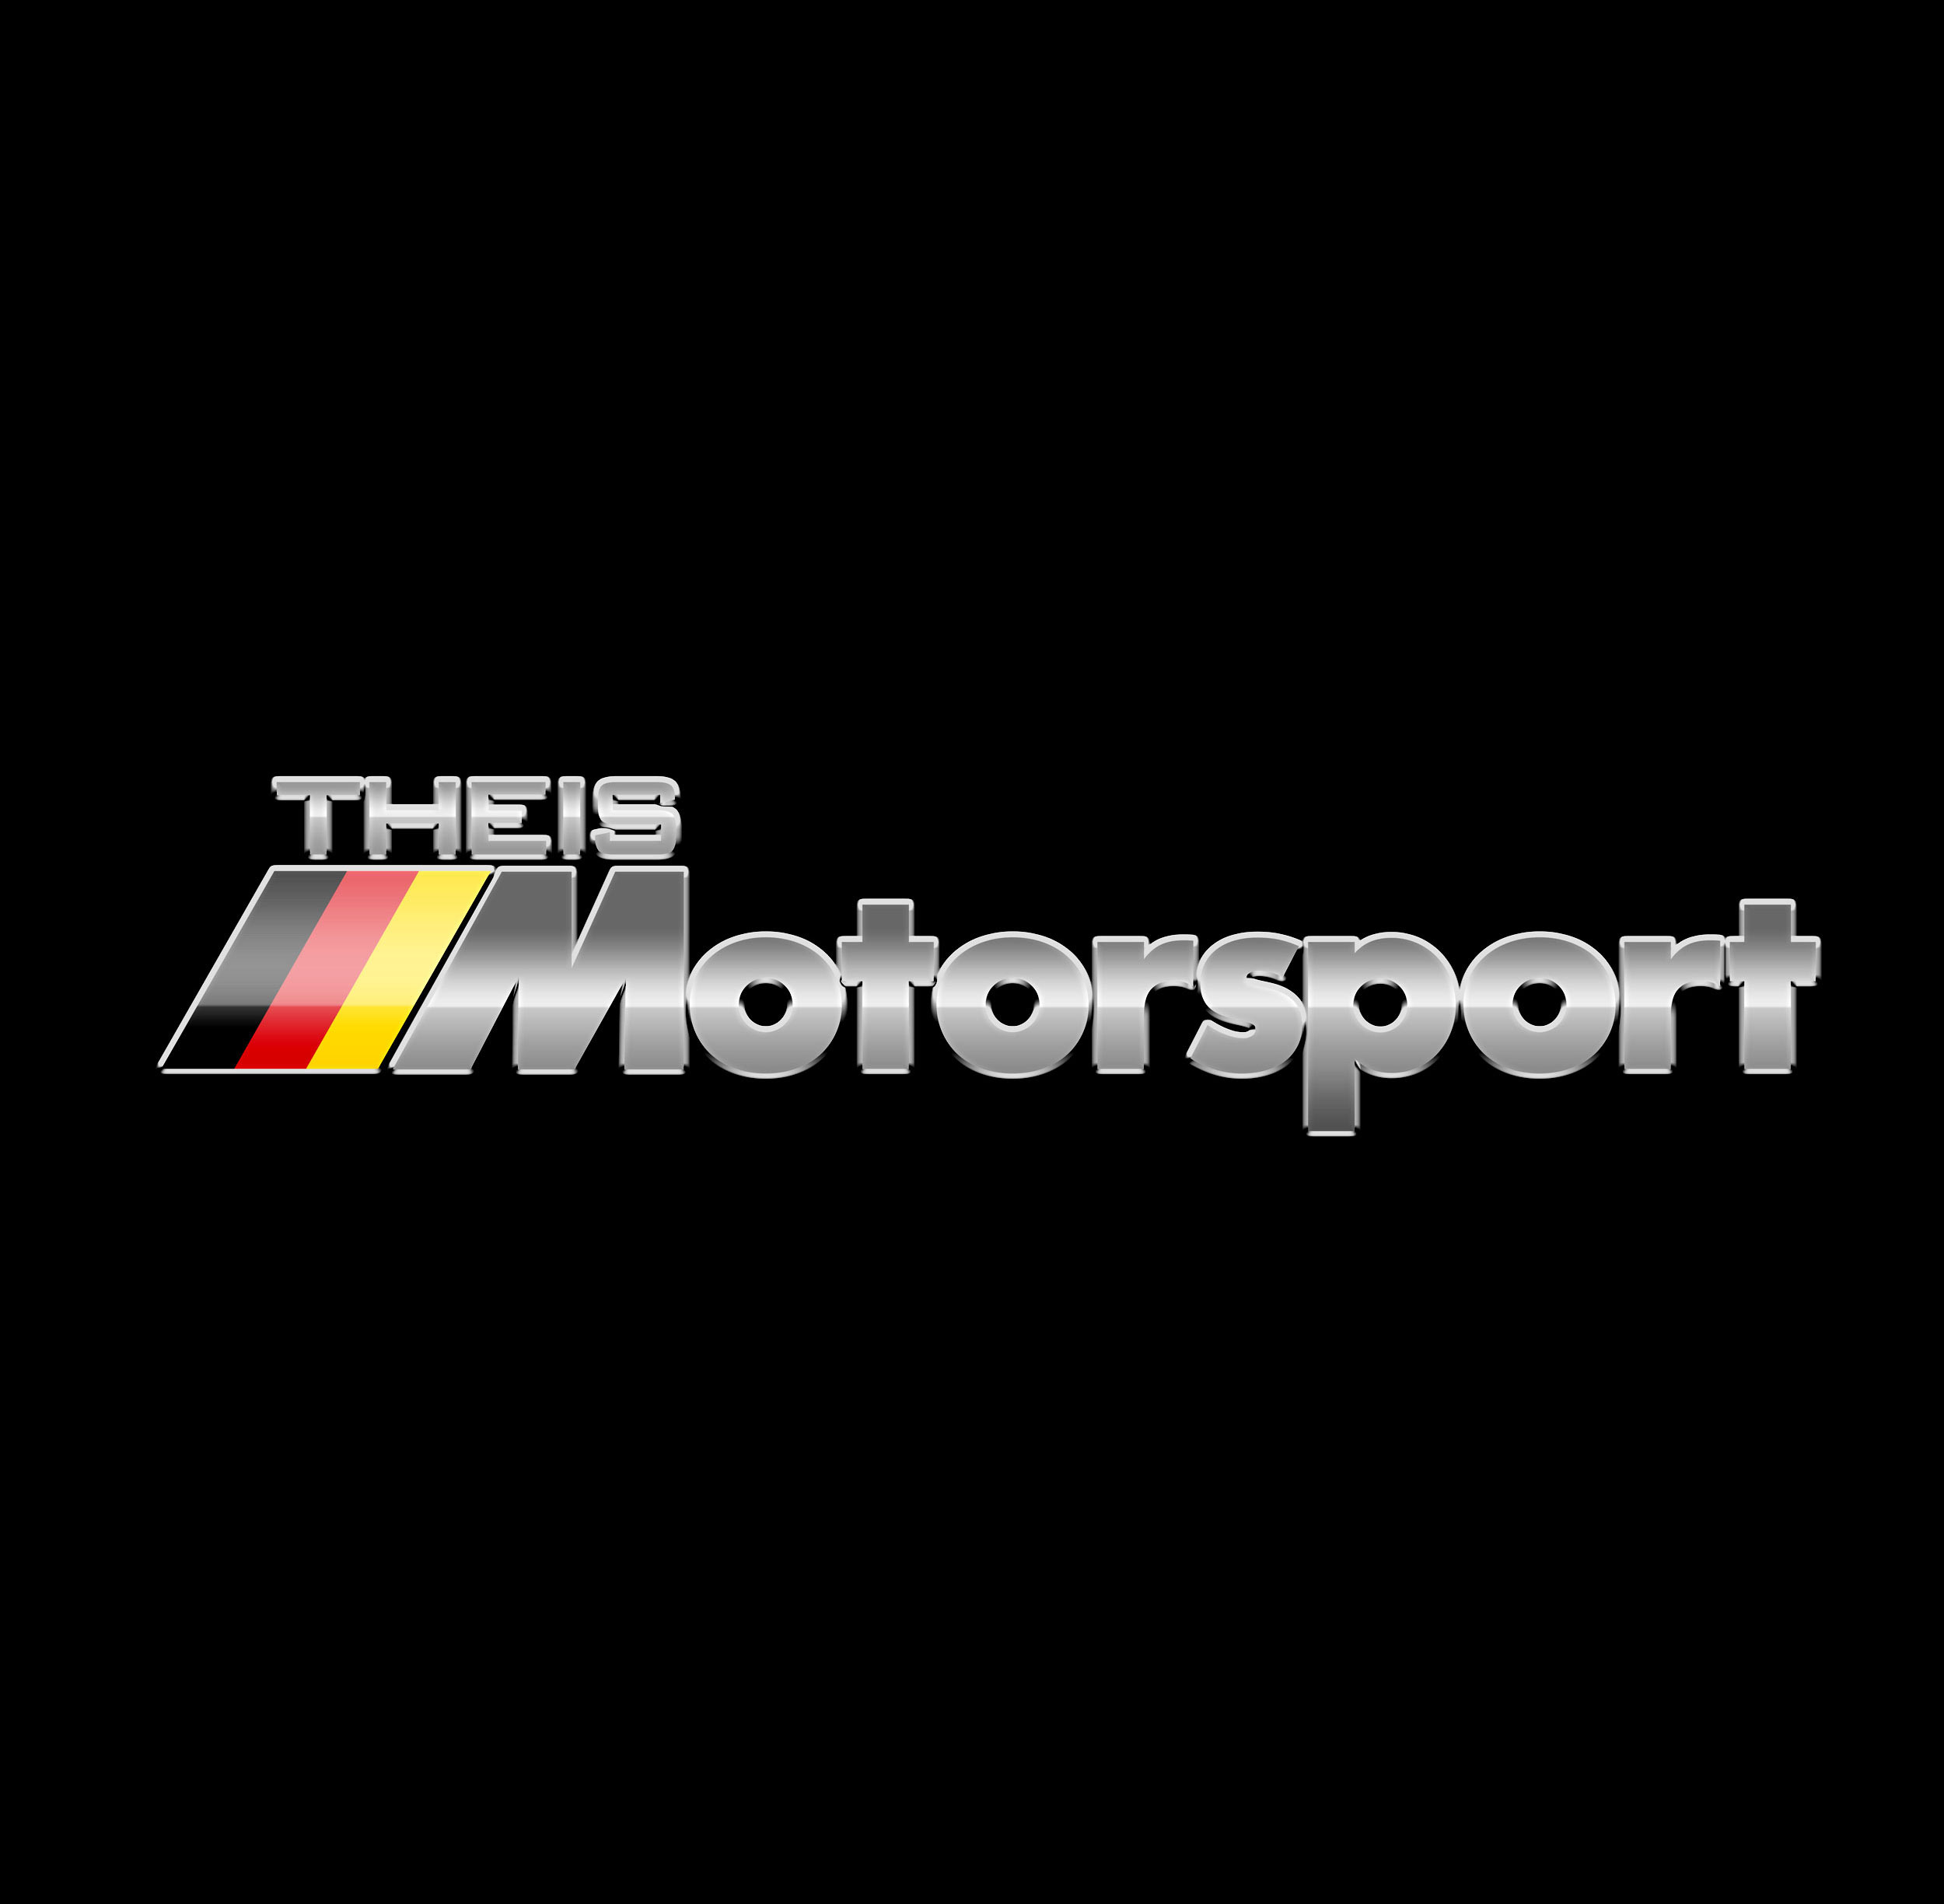 Theis Motorsport Logo